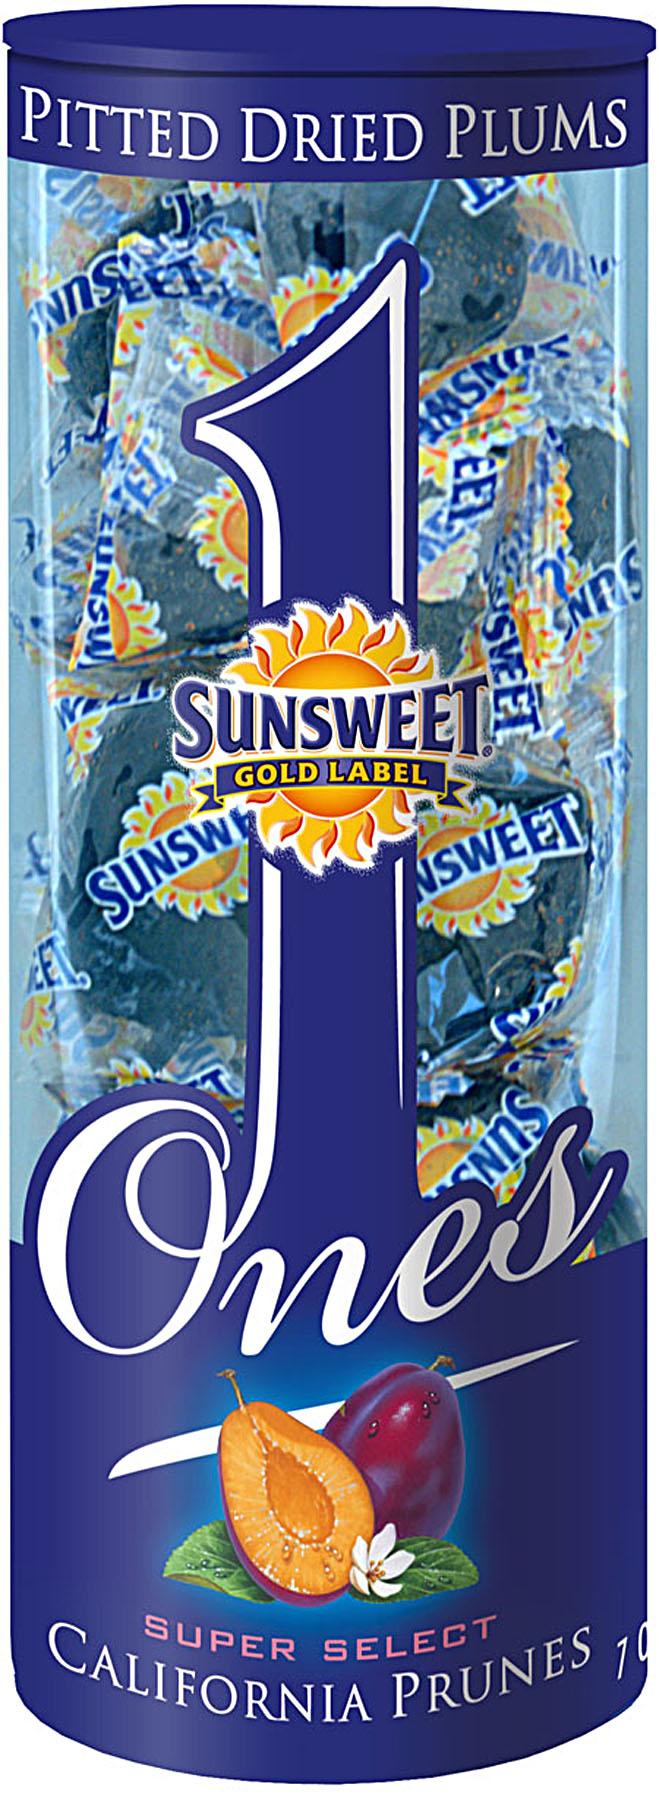 sunsweet pdf California belong to sunsweet growers inc sunsweet growers inc is the us  industry's    california .